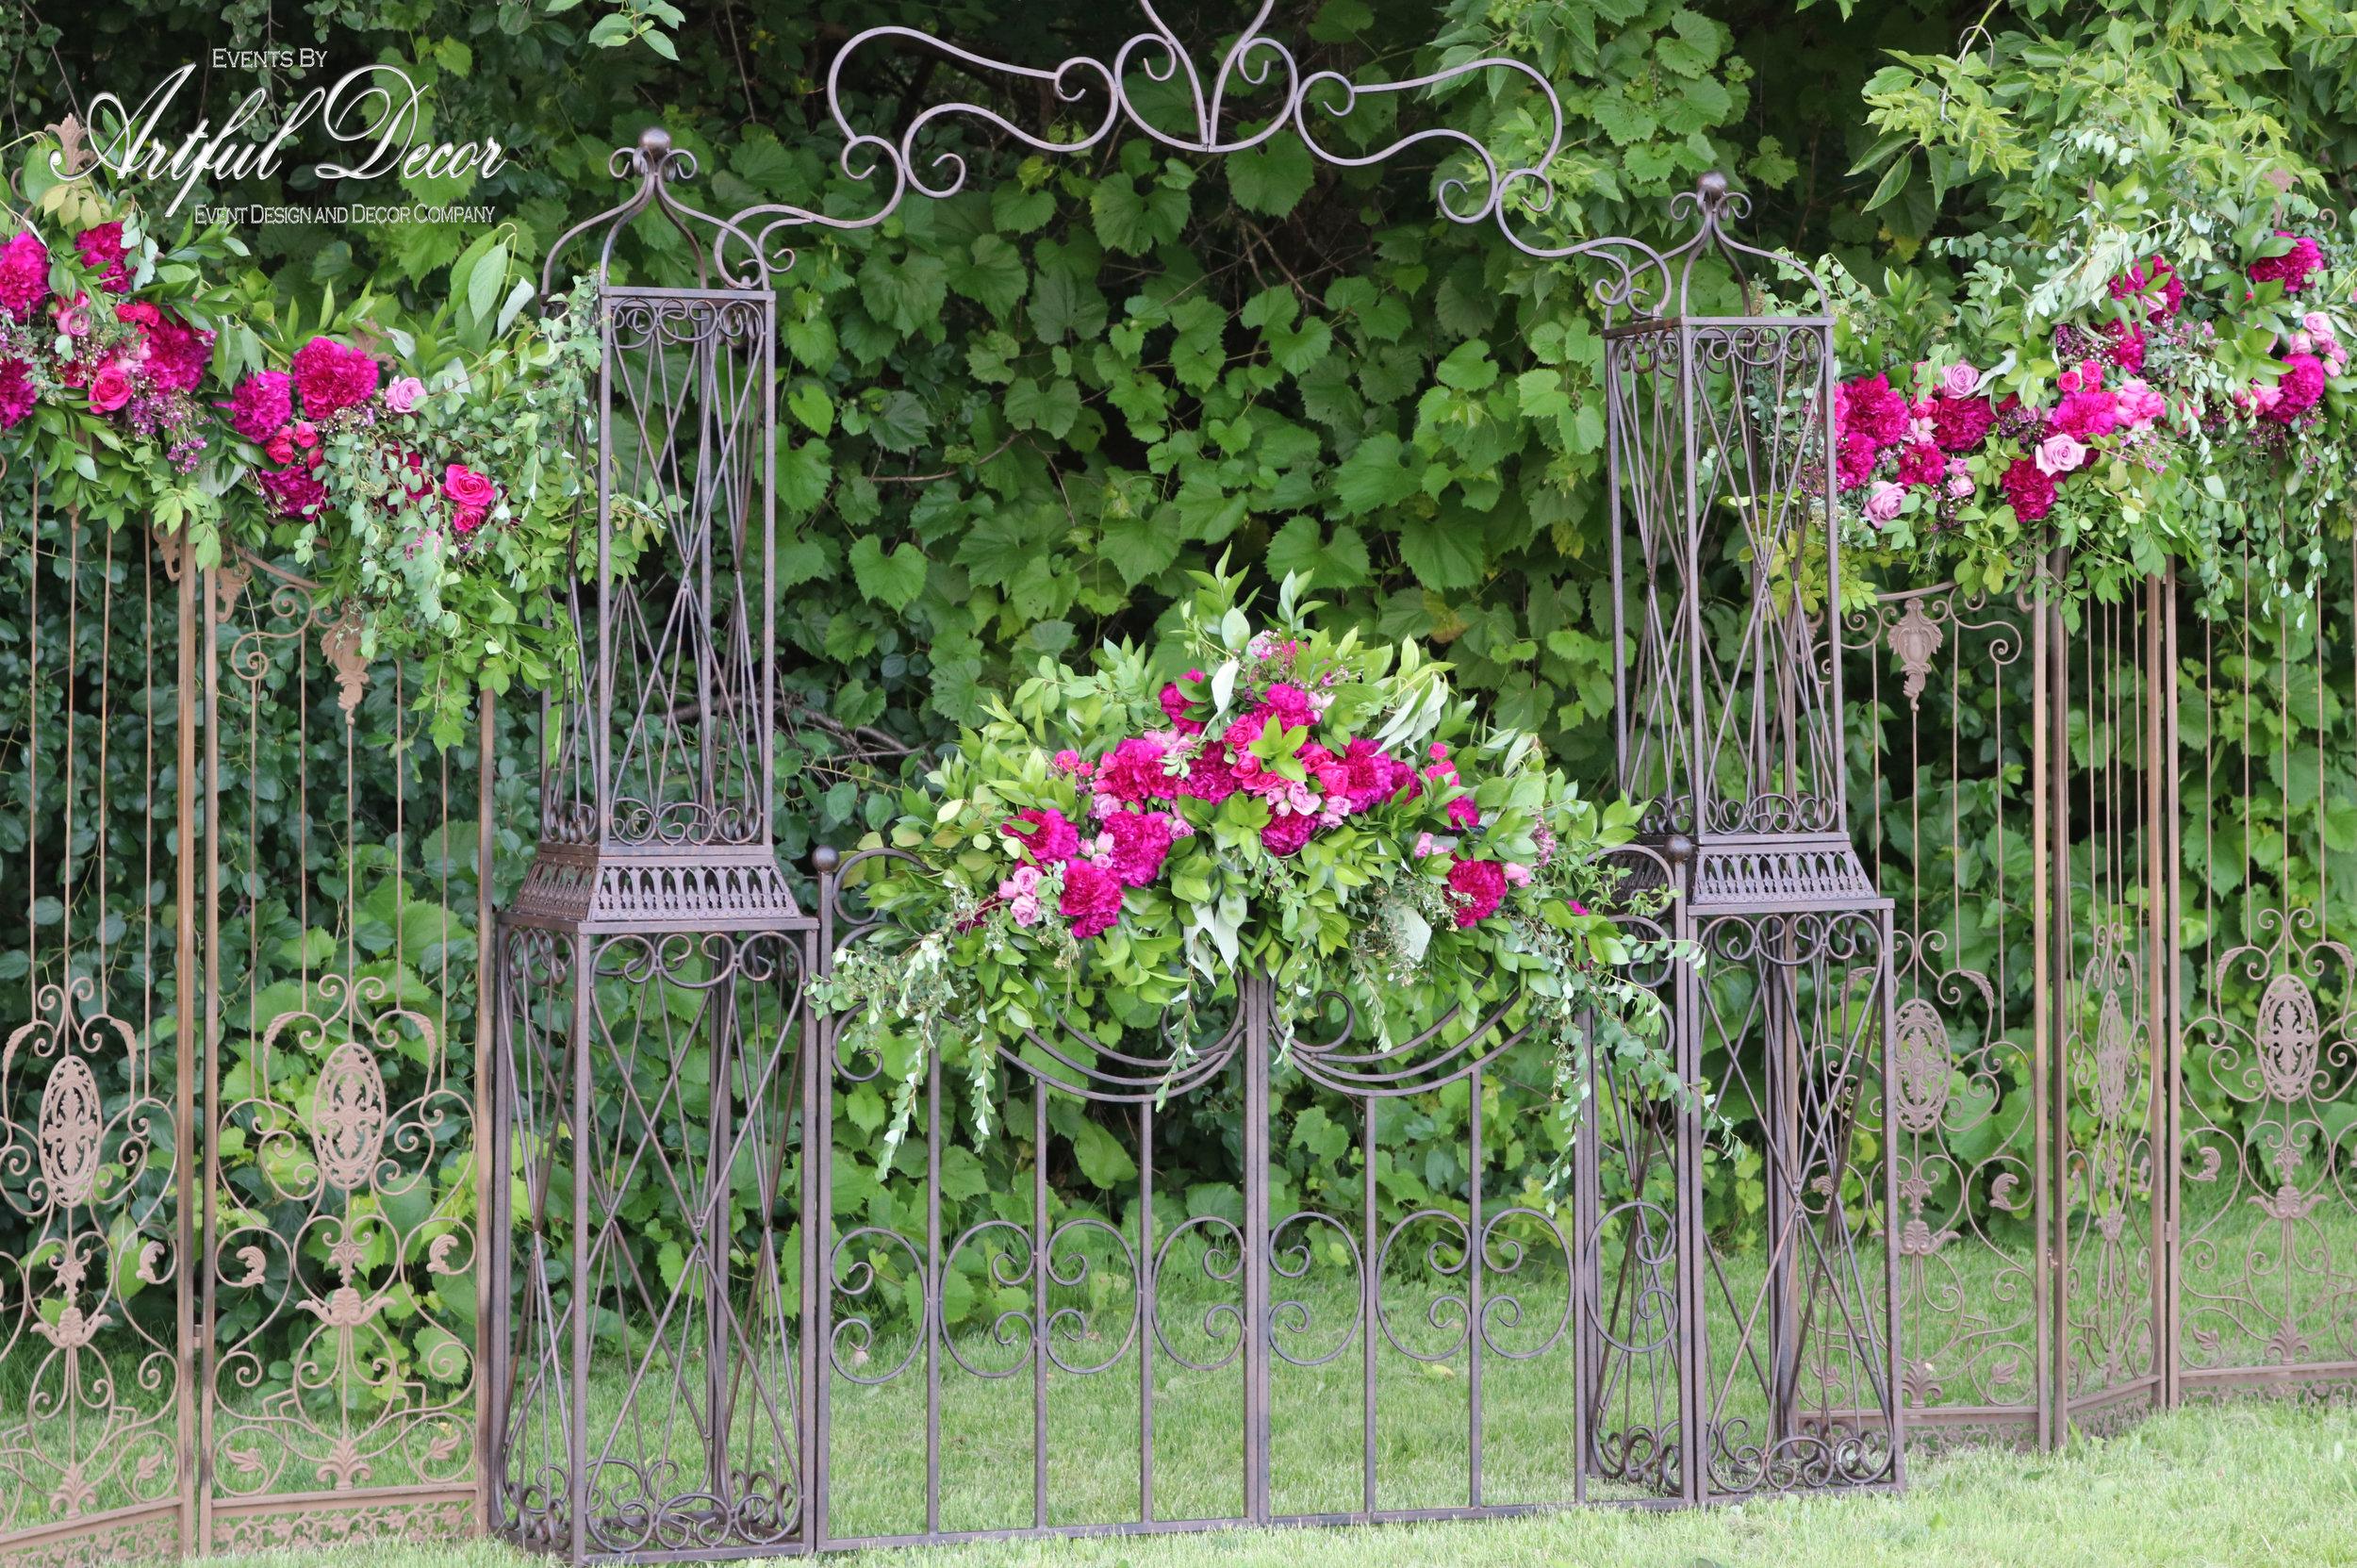 Garden Gate 55 Copyright.jpg